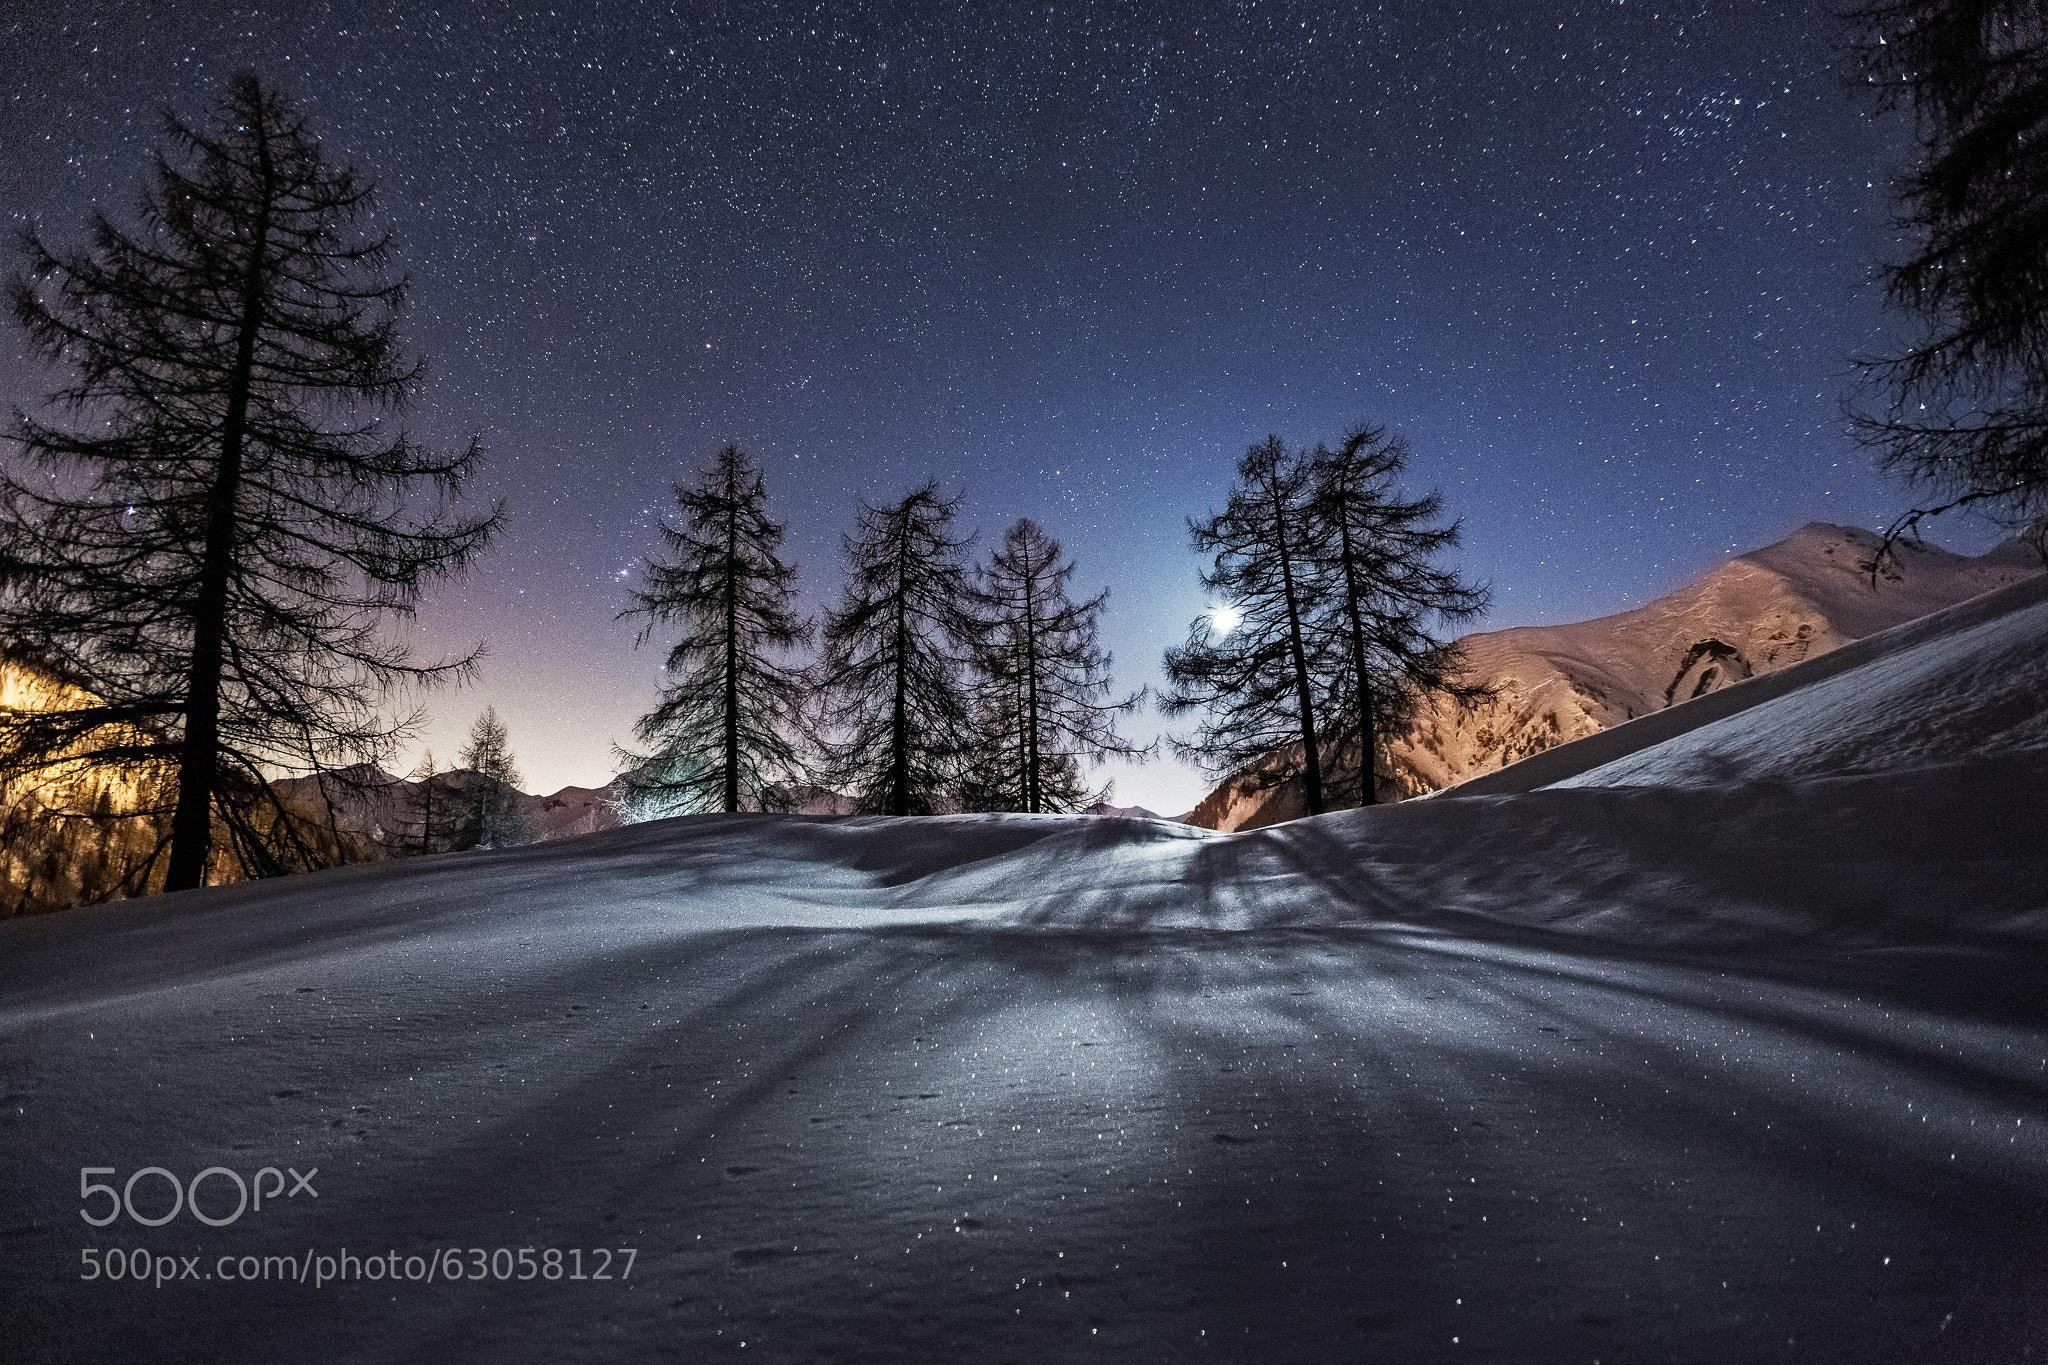 Photograph Moon Followers by Davide Arizzi on 500px